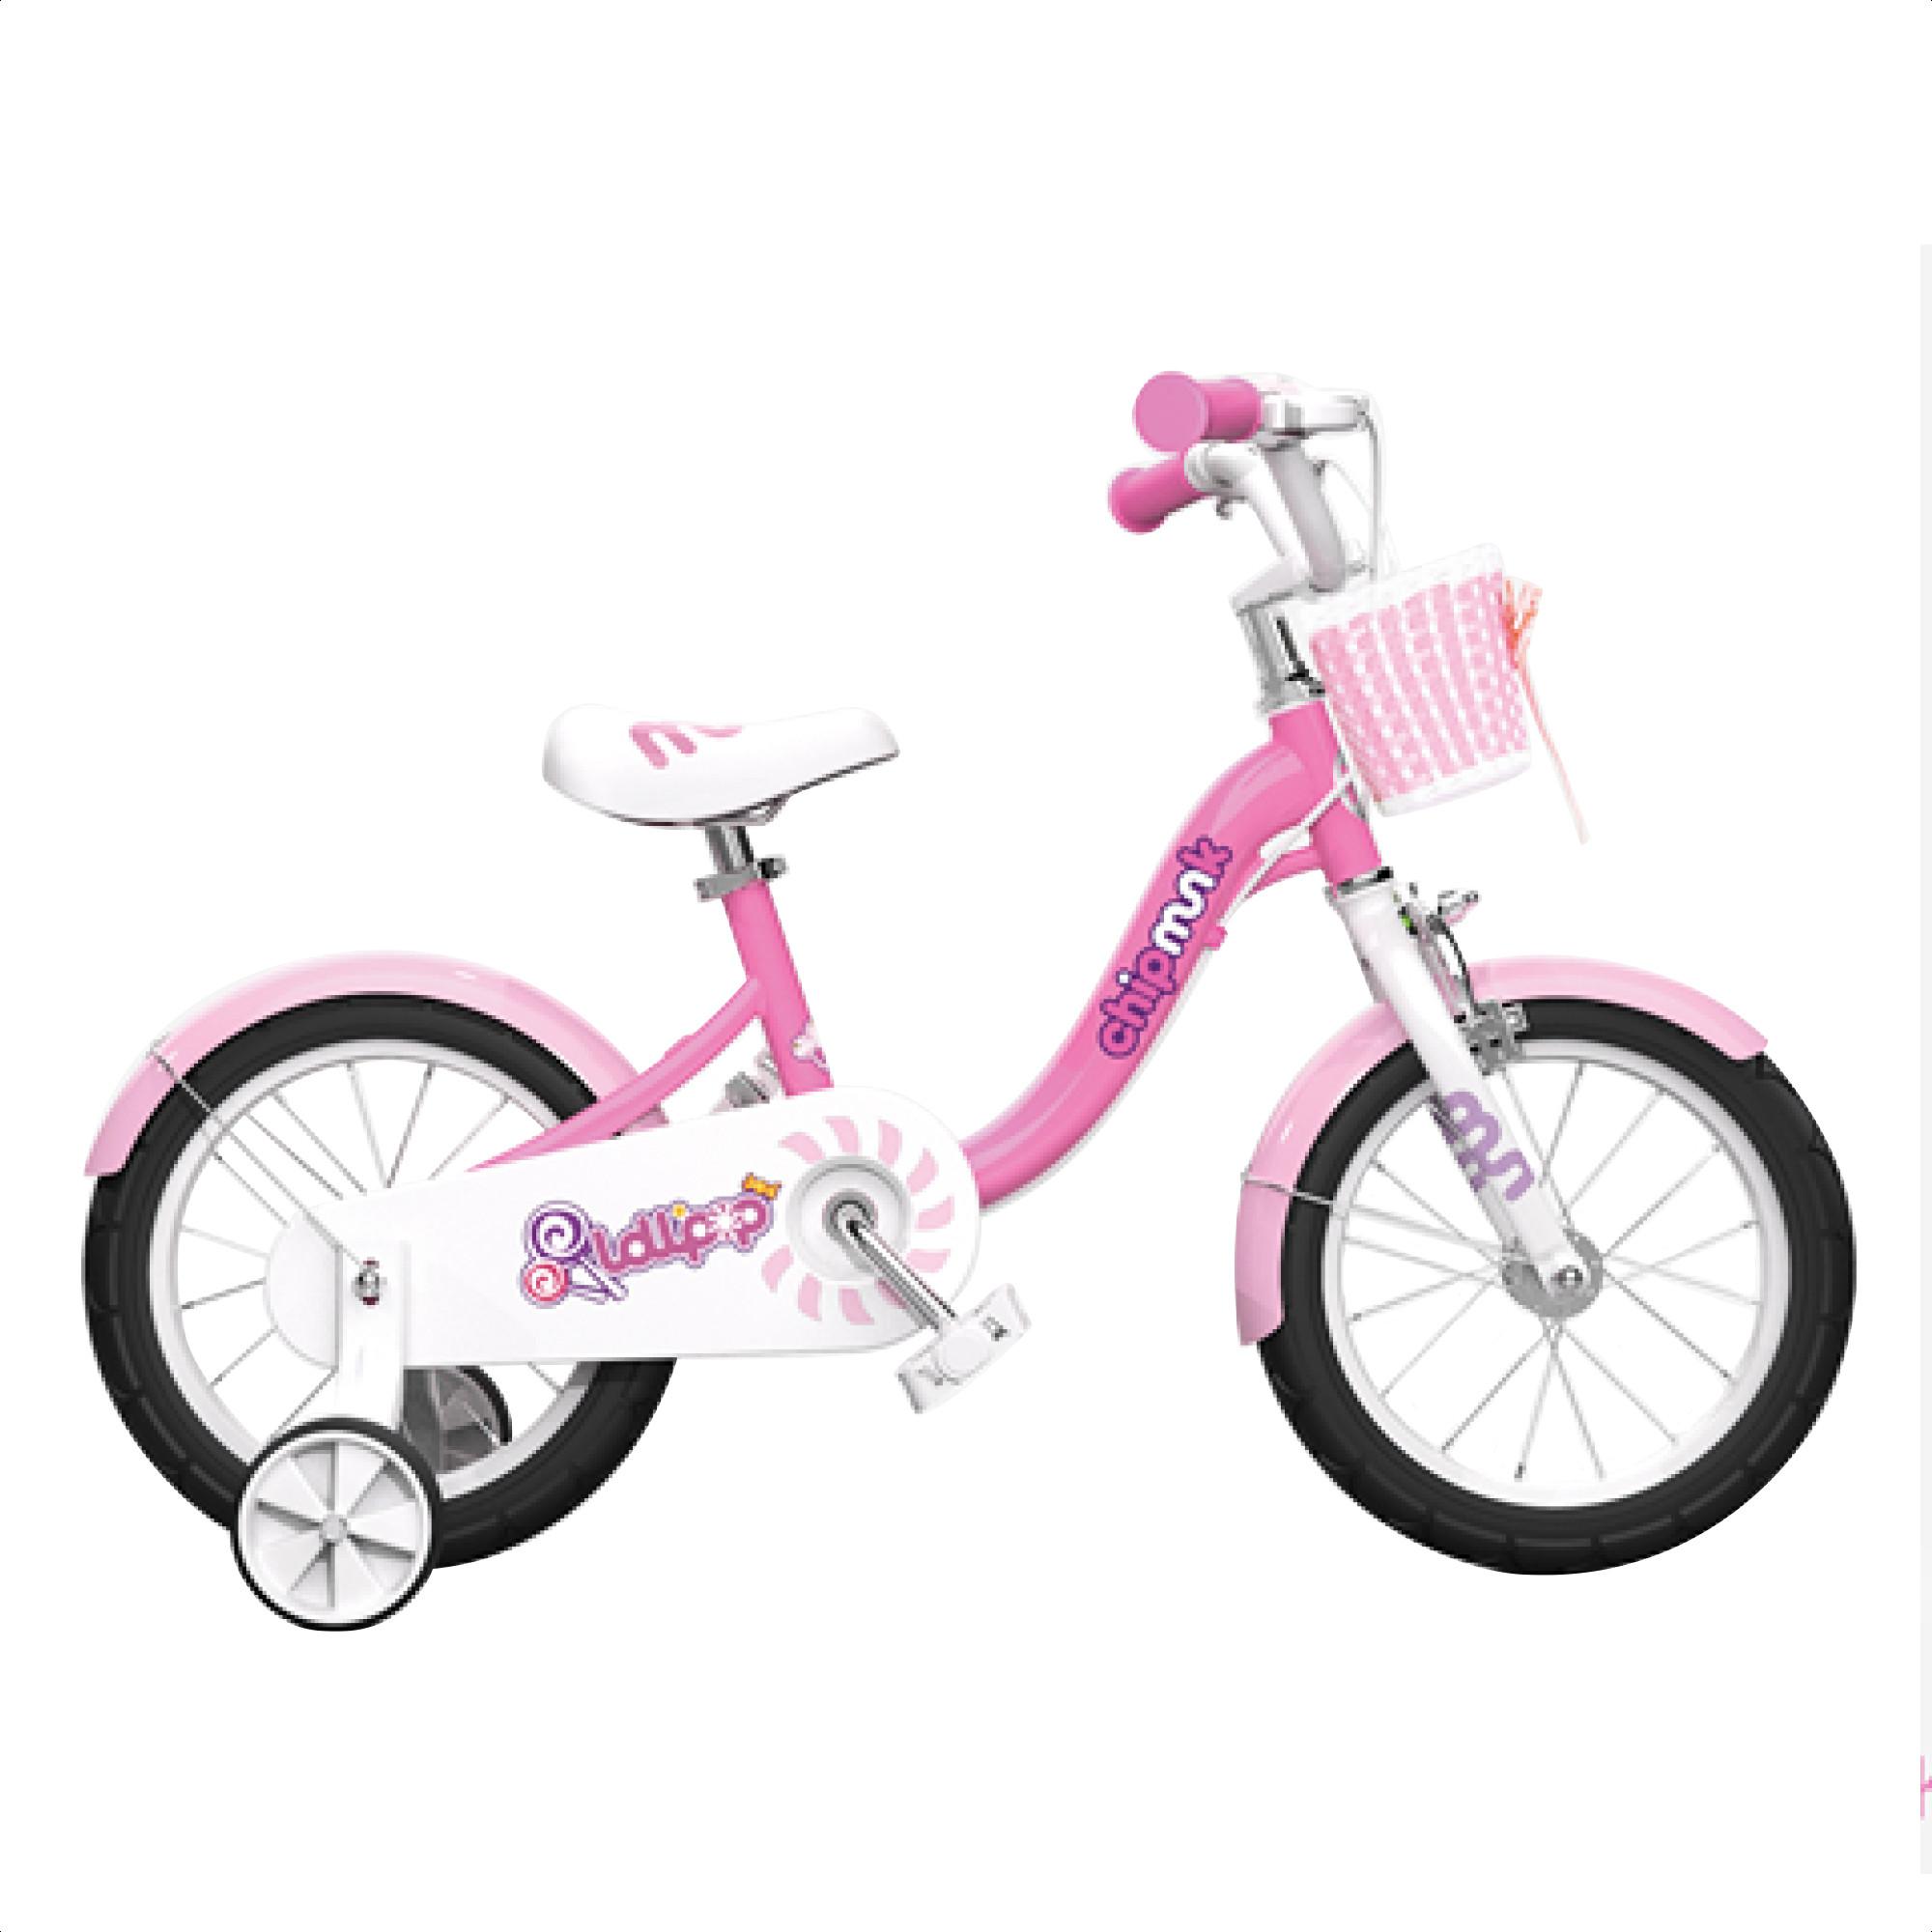 Bicicleta Infantil Royal Baby Chipmunk Mm Rodado 12